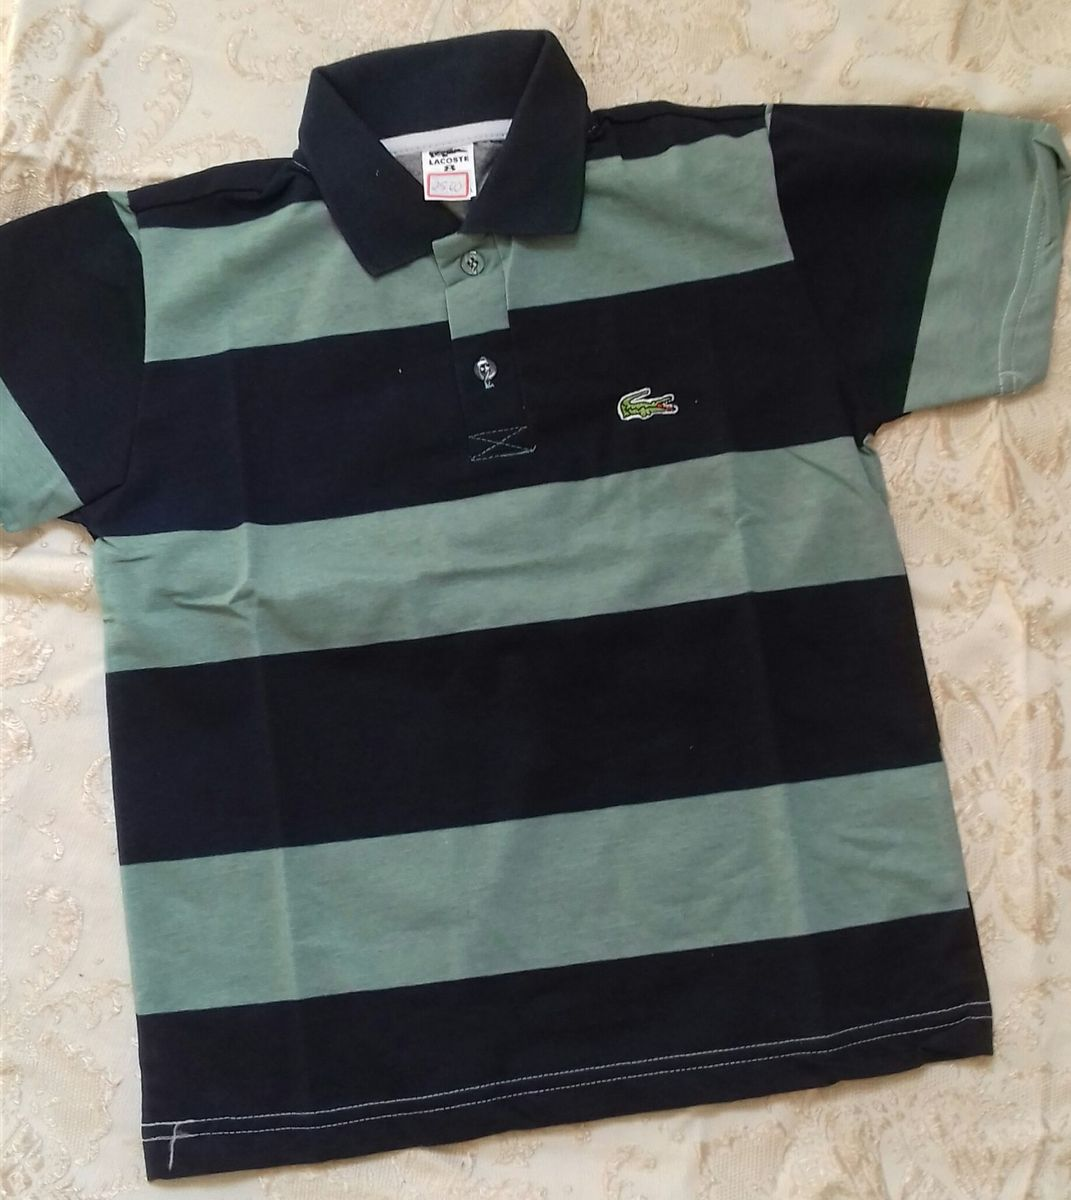 3f7bc8923f9e1 camiseta gola polo - menino lacoste.  Czm6ly9wag90b3muzw5qb2vplmnvbs5ici9wcm9kdwn0cy81mzkxntq2lzu0ytqwytazmwu5ytqwndaxzjllnddjmzuxntqxztk0lmpwzw  ...